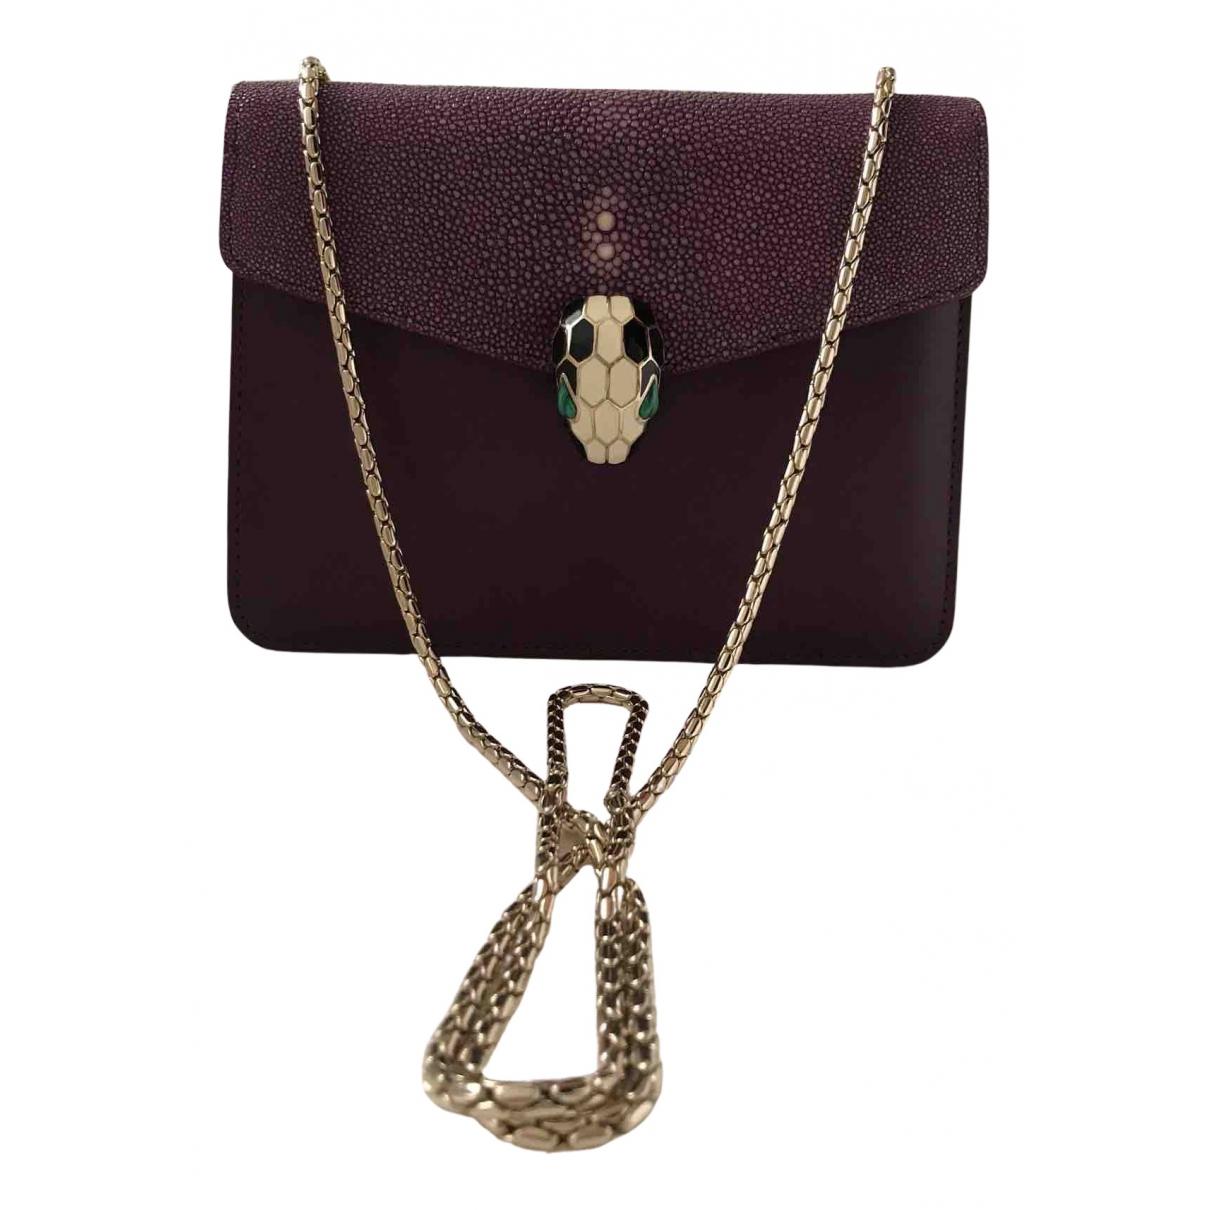 Bvlgari - Sac a main Serpenti pour femme en galuchat - violet